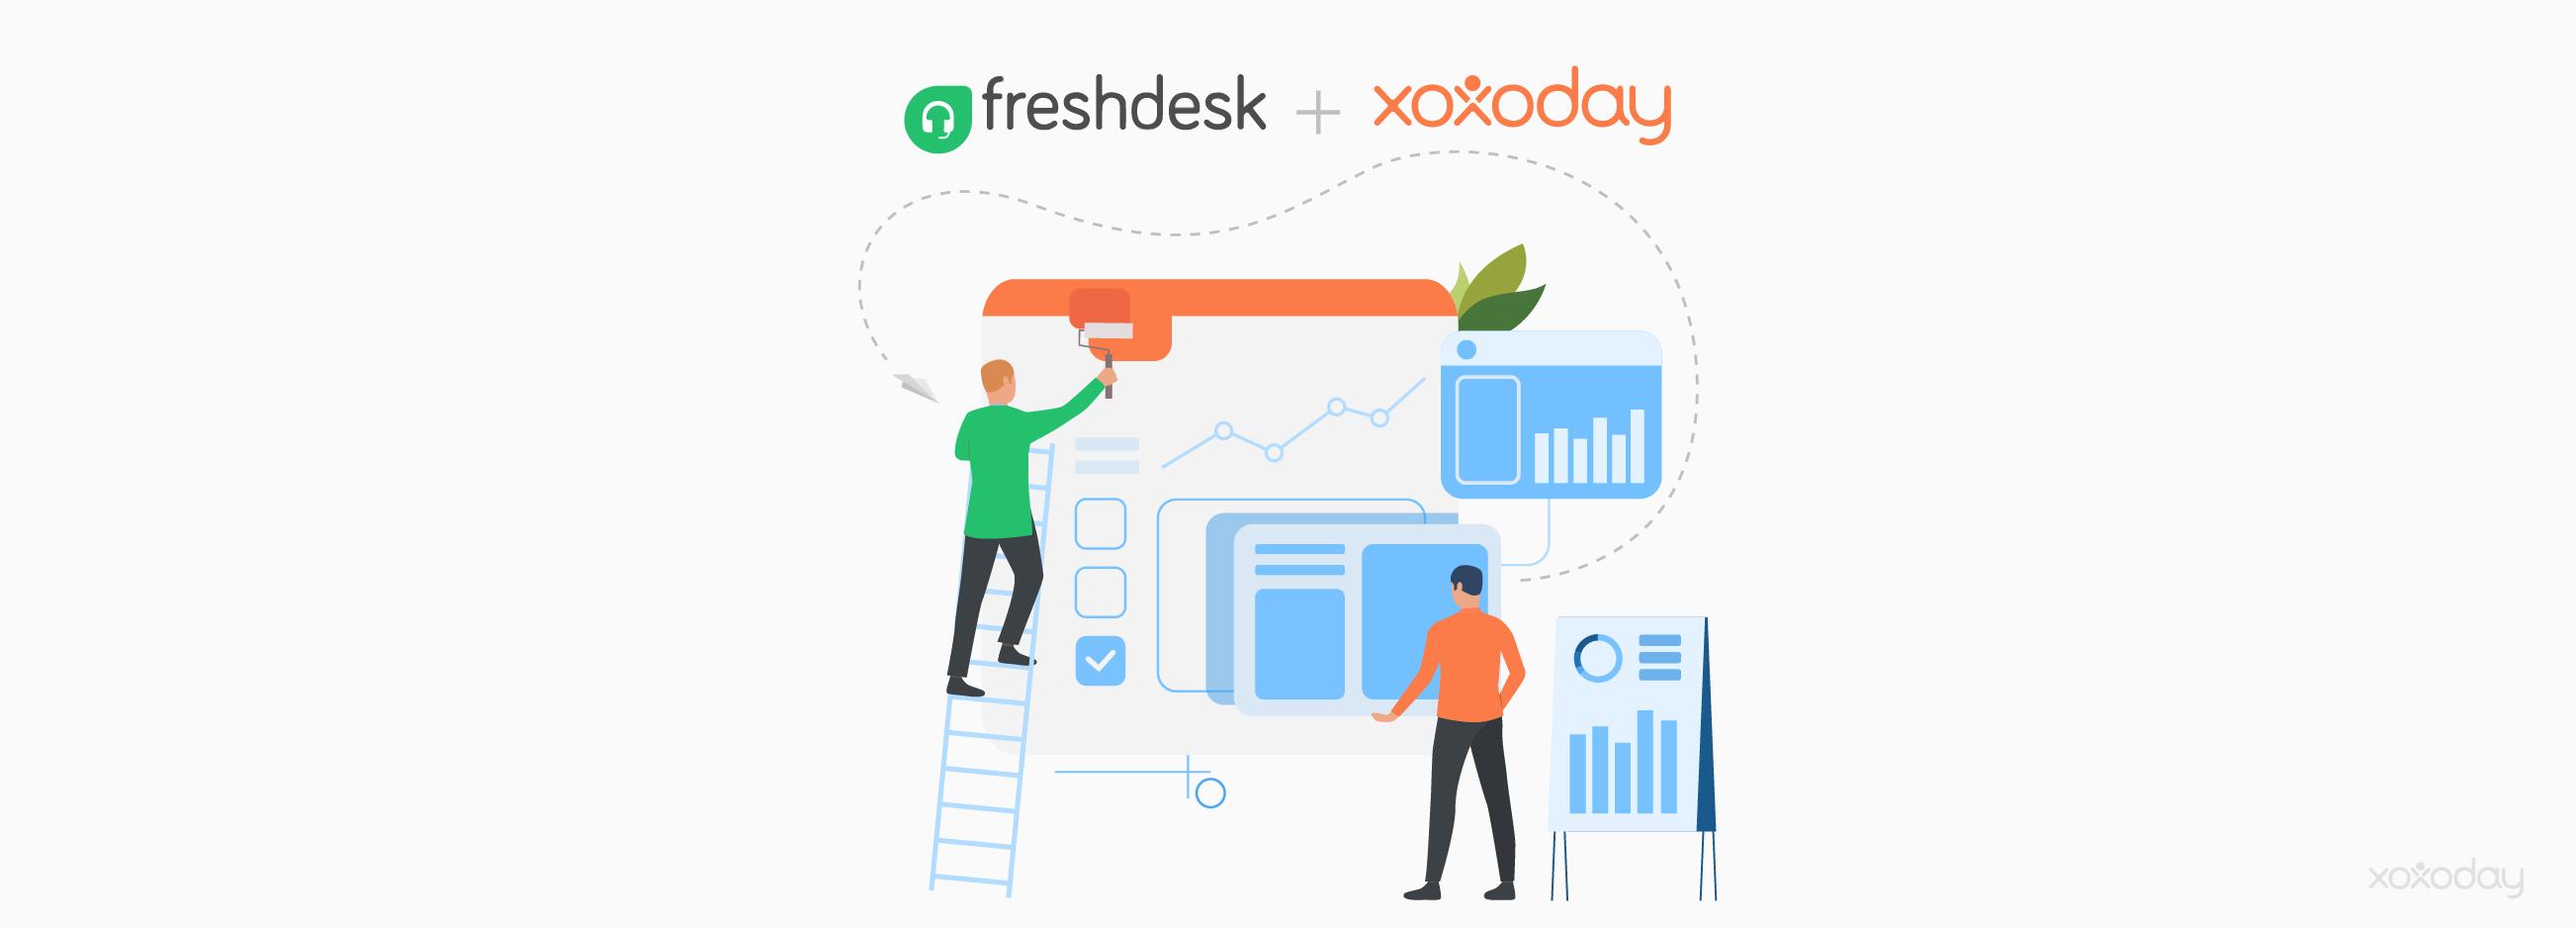 Xoxoday-Freshdesk Integration Aims to Motivate Customer Support with Milestone-Based Rewards